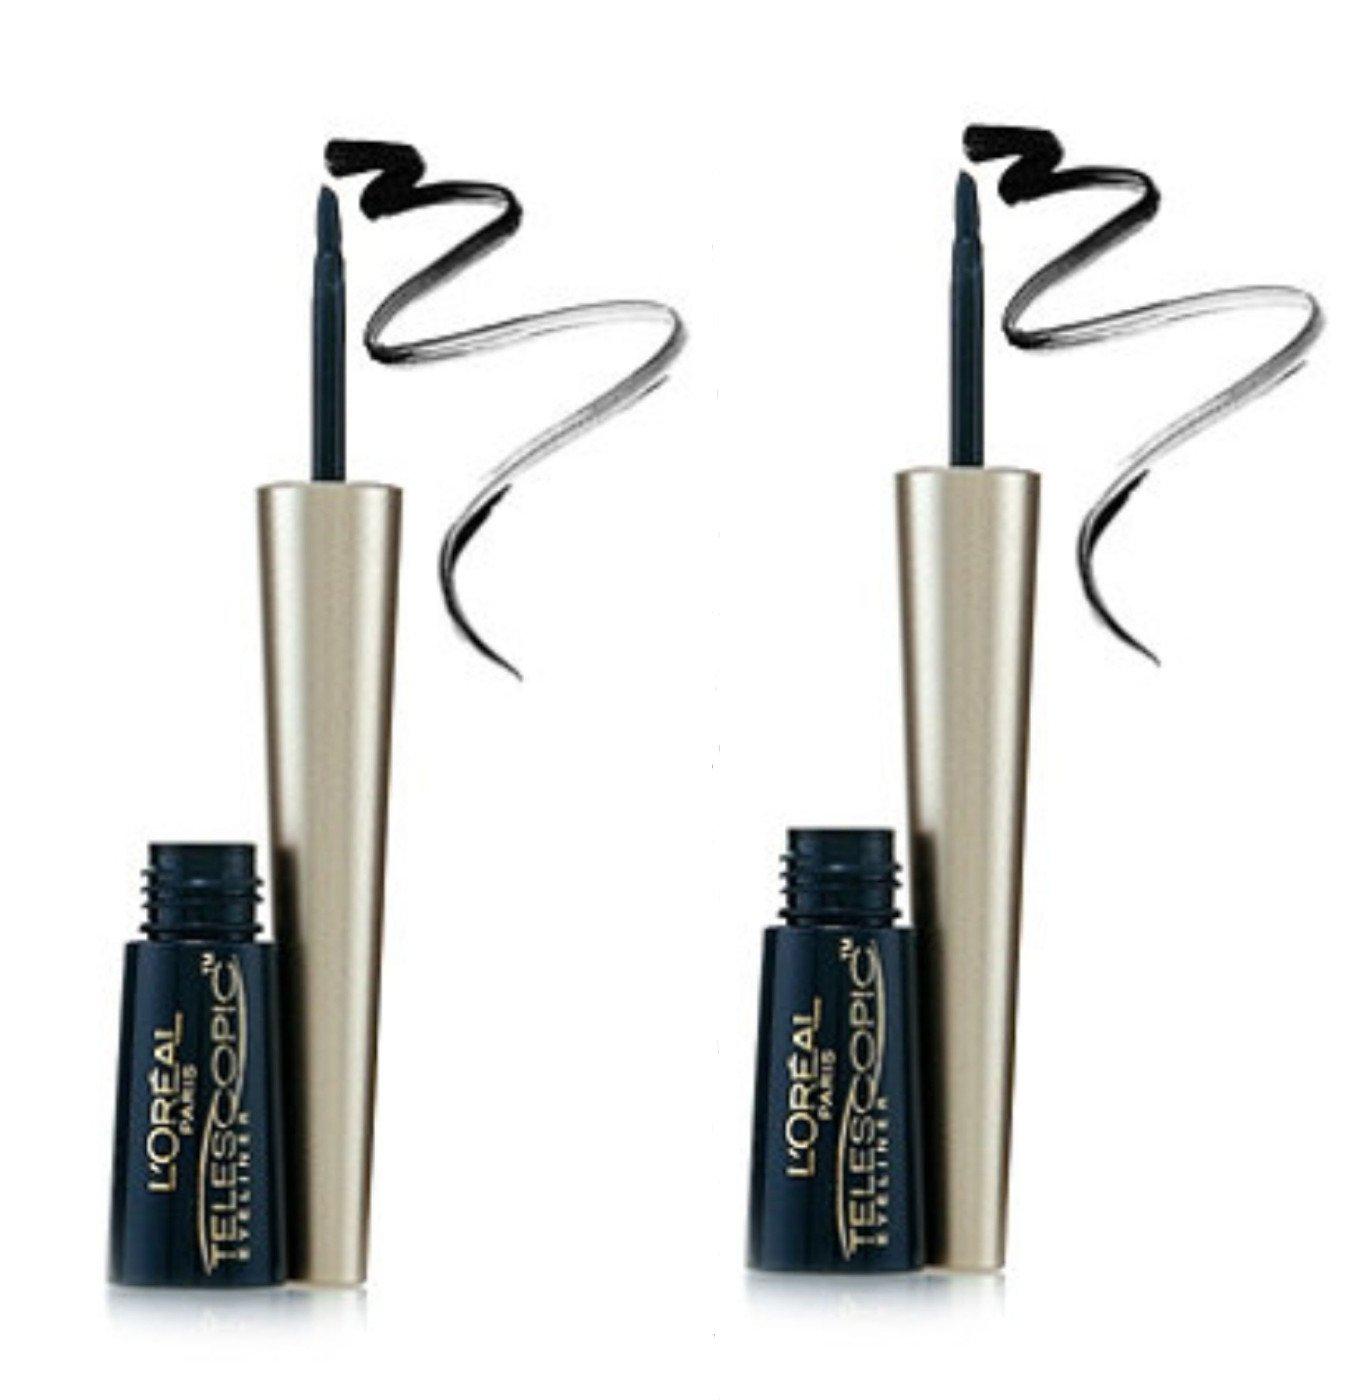 L'Oreal Telescopic Precision Liquid Eyeliner, Black [810] 0.08 oz (Pack of 2)